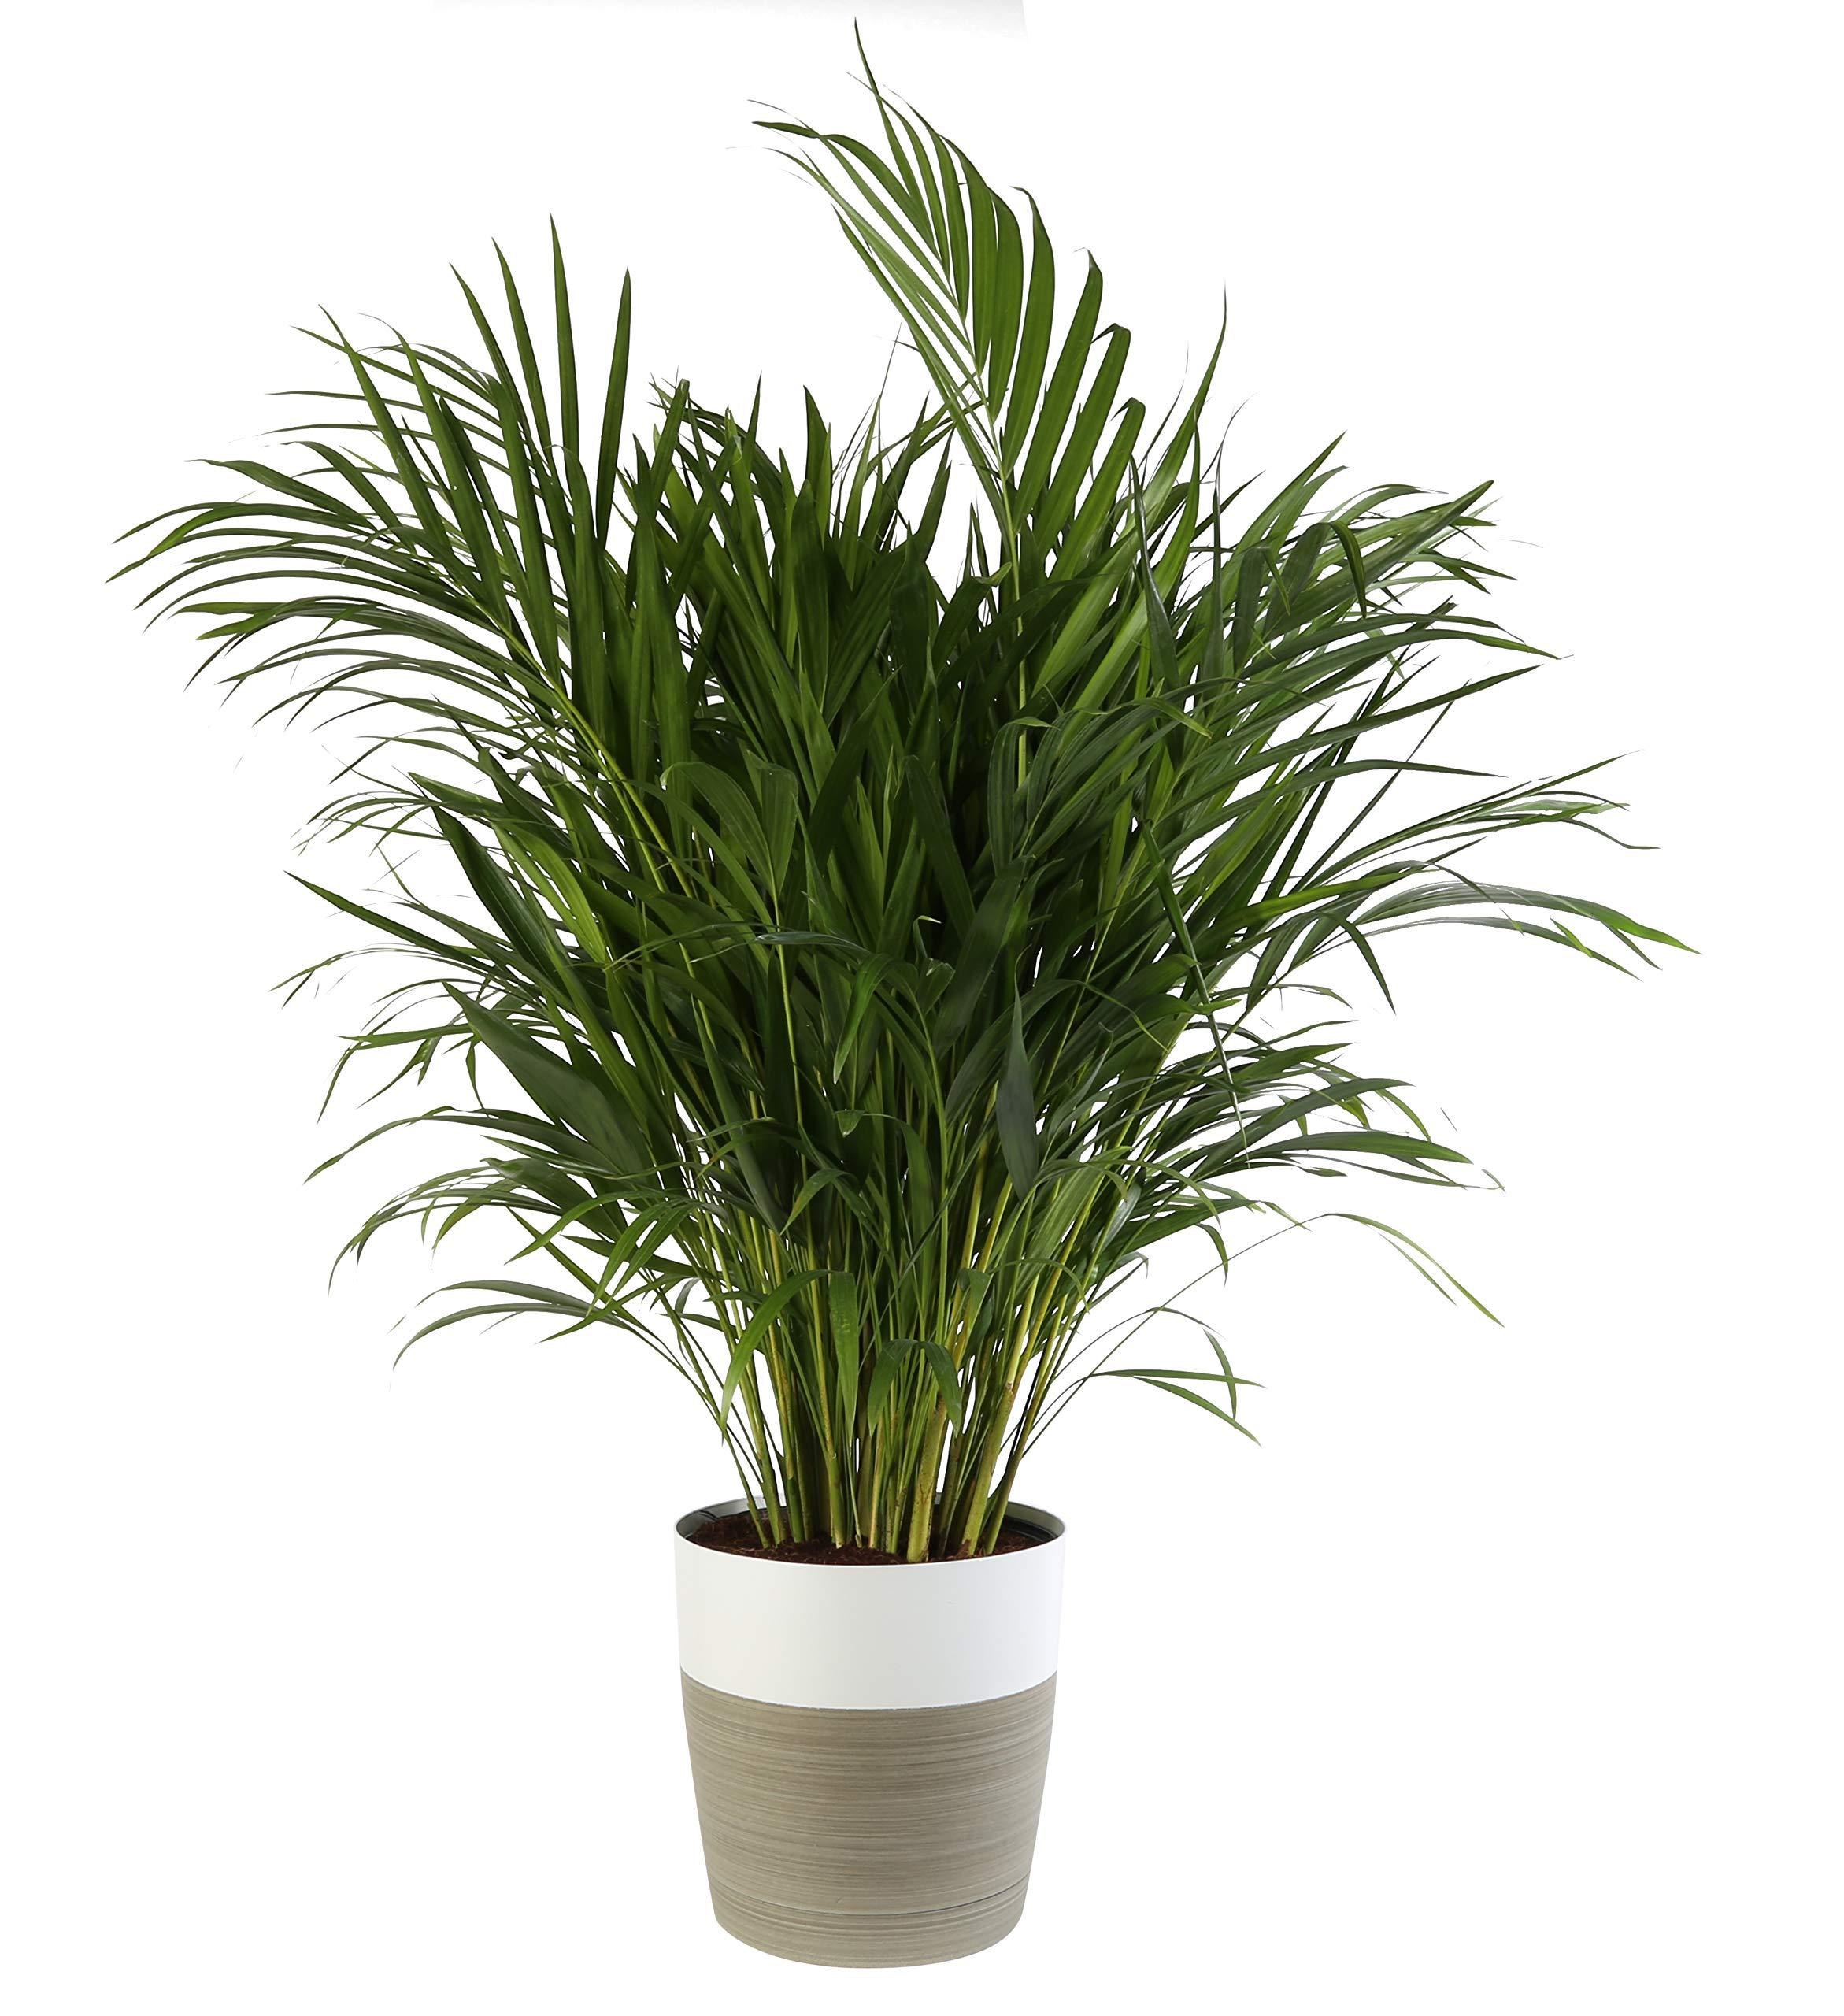 Costa Farms Live Areca Palm in Decor Planter, 3-Foot, White-Natural by Costa Farms